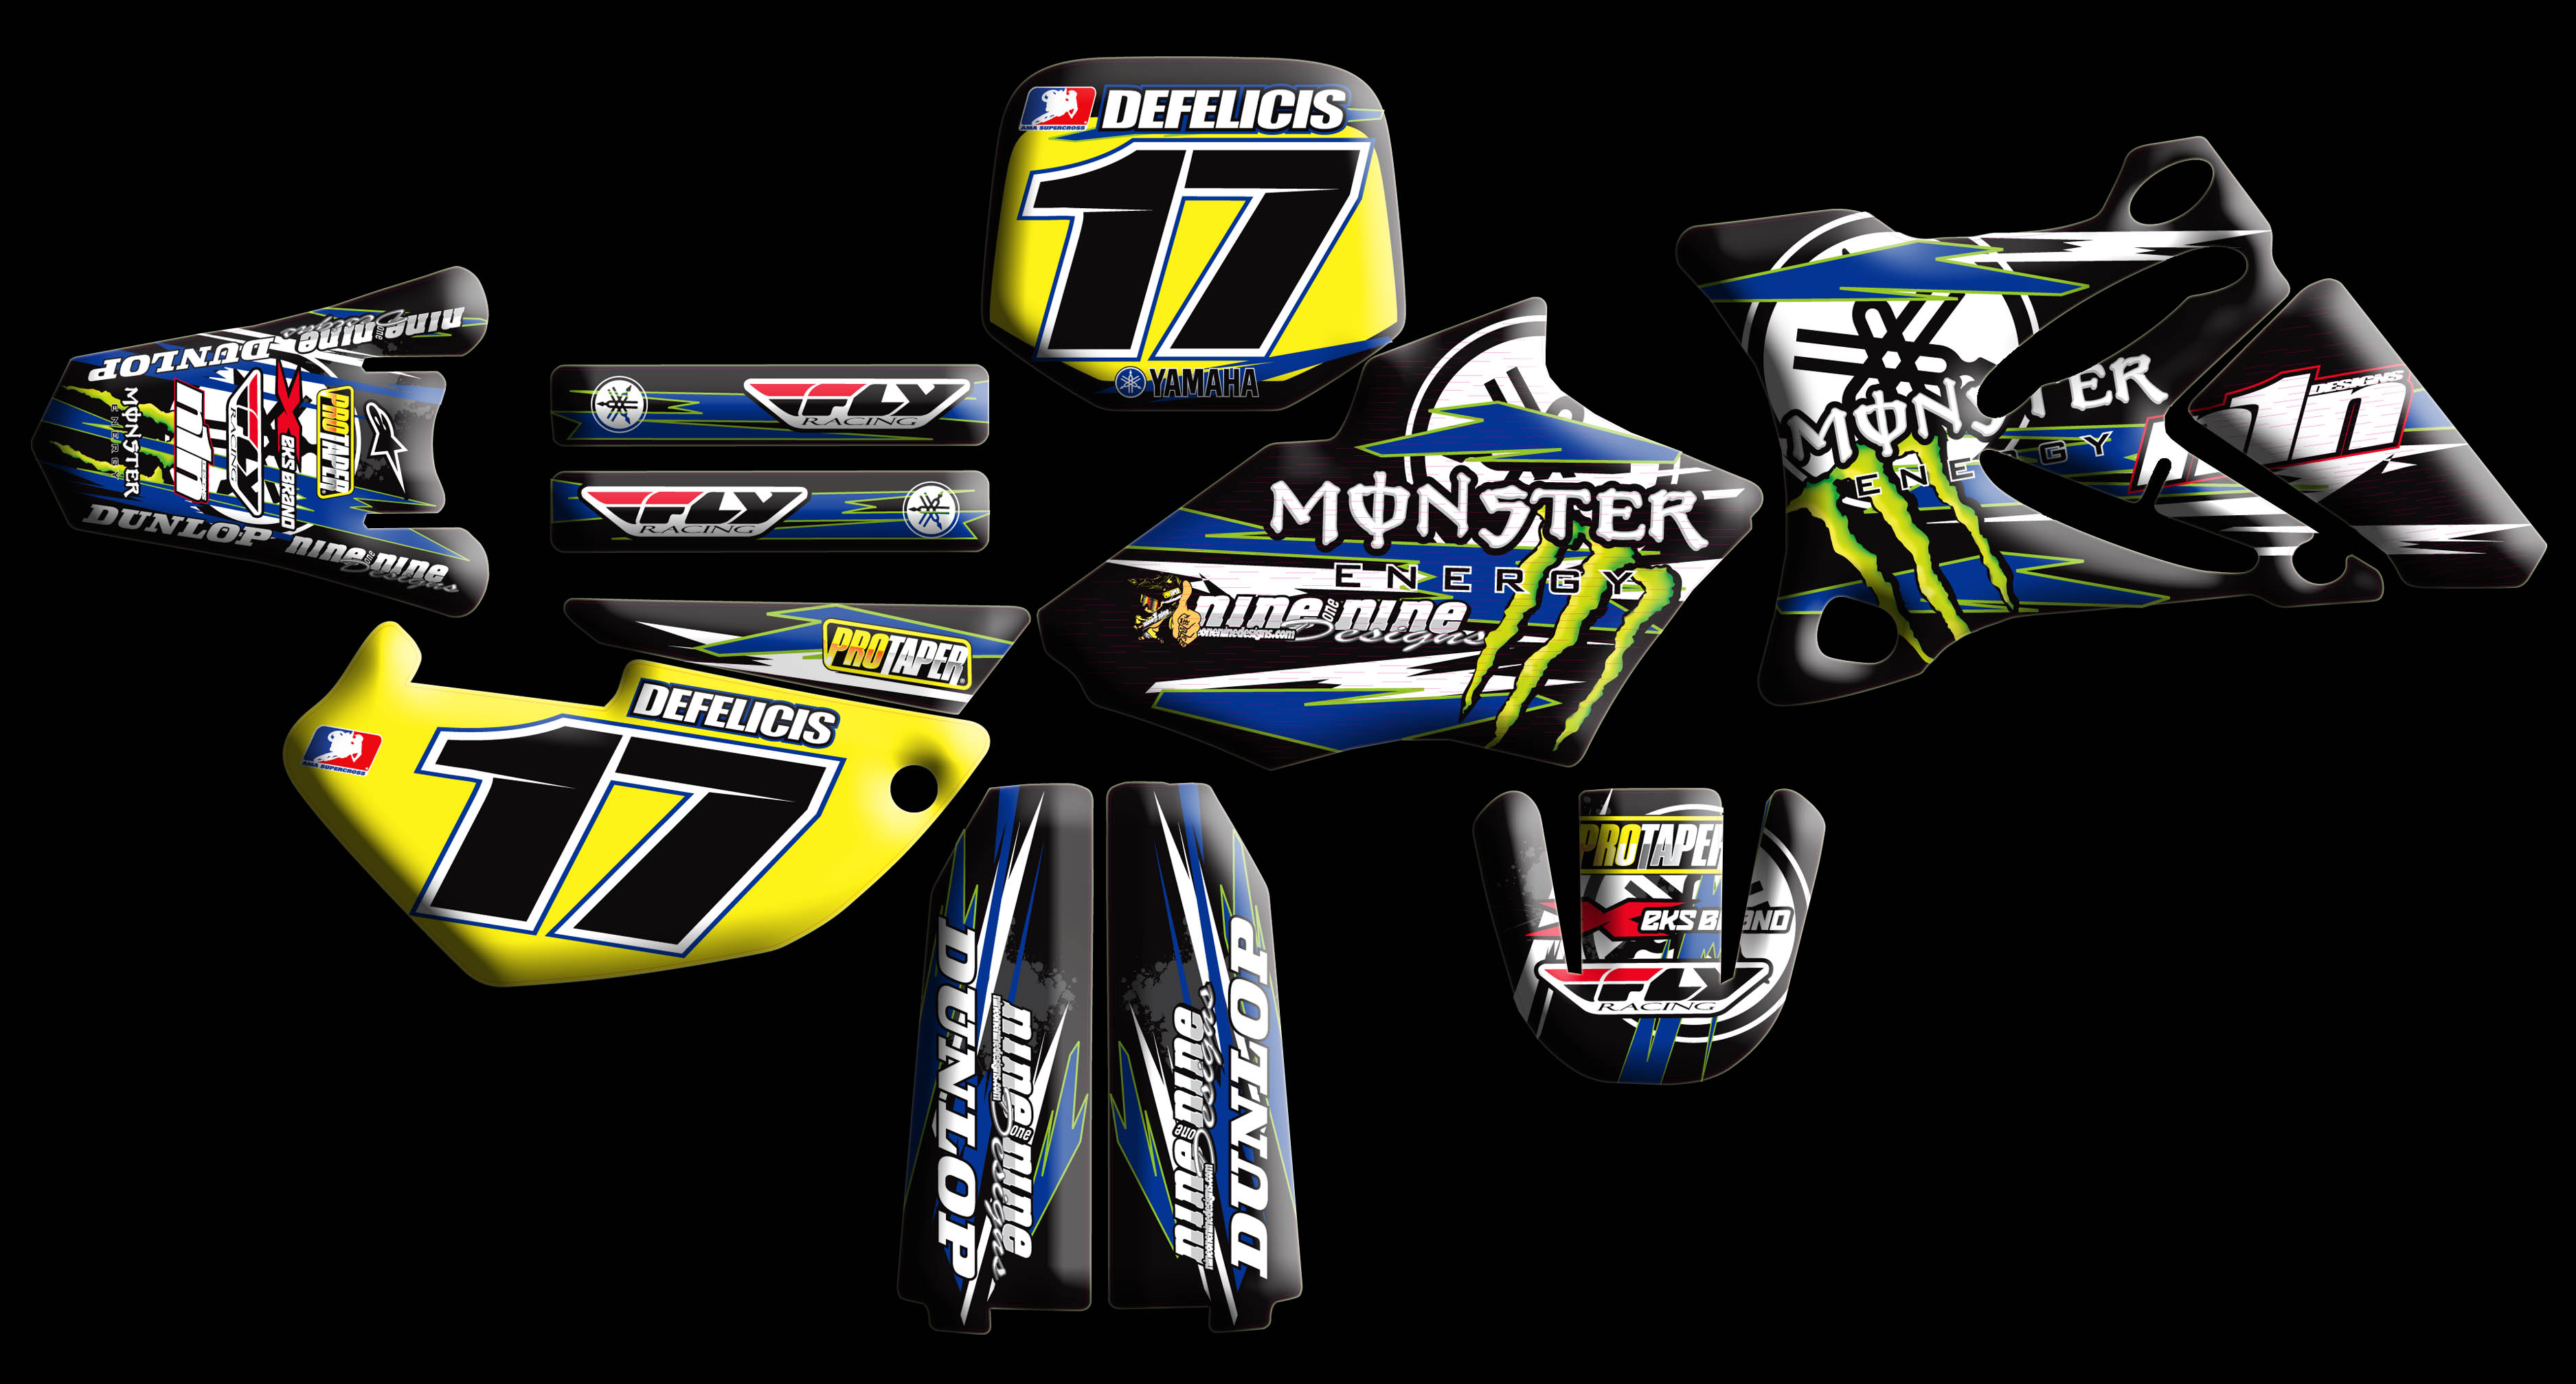 Yamaha full kits nineonenine designs for Designs com